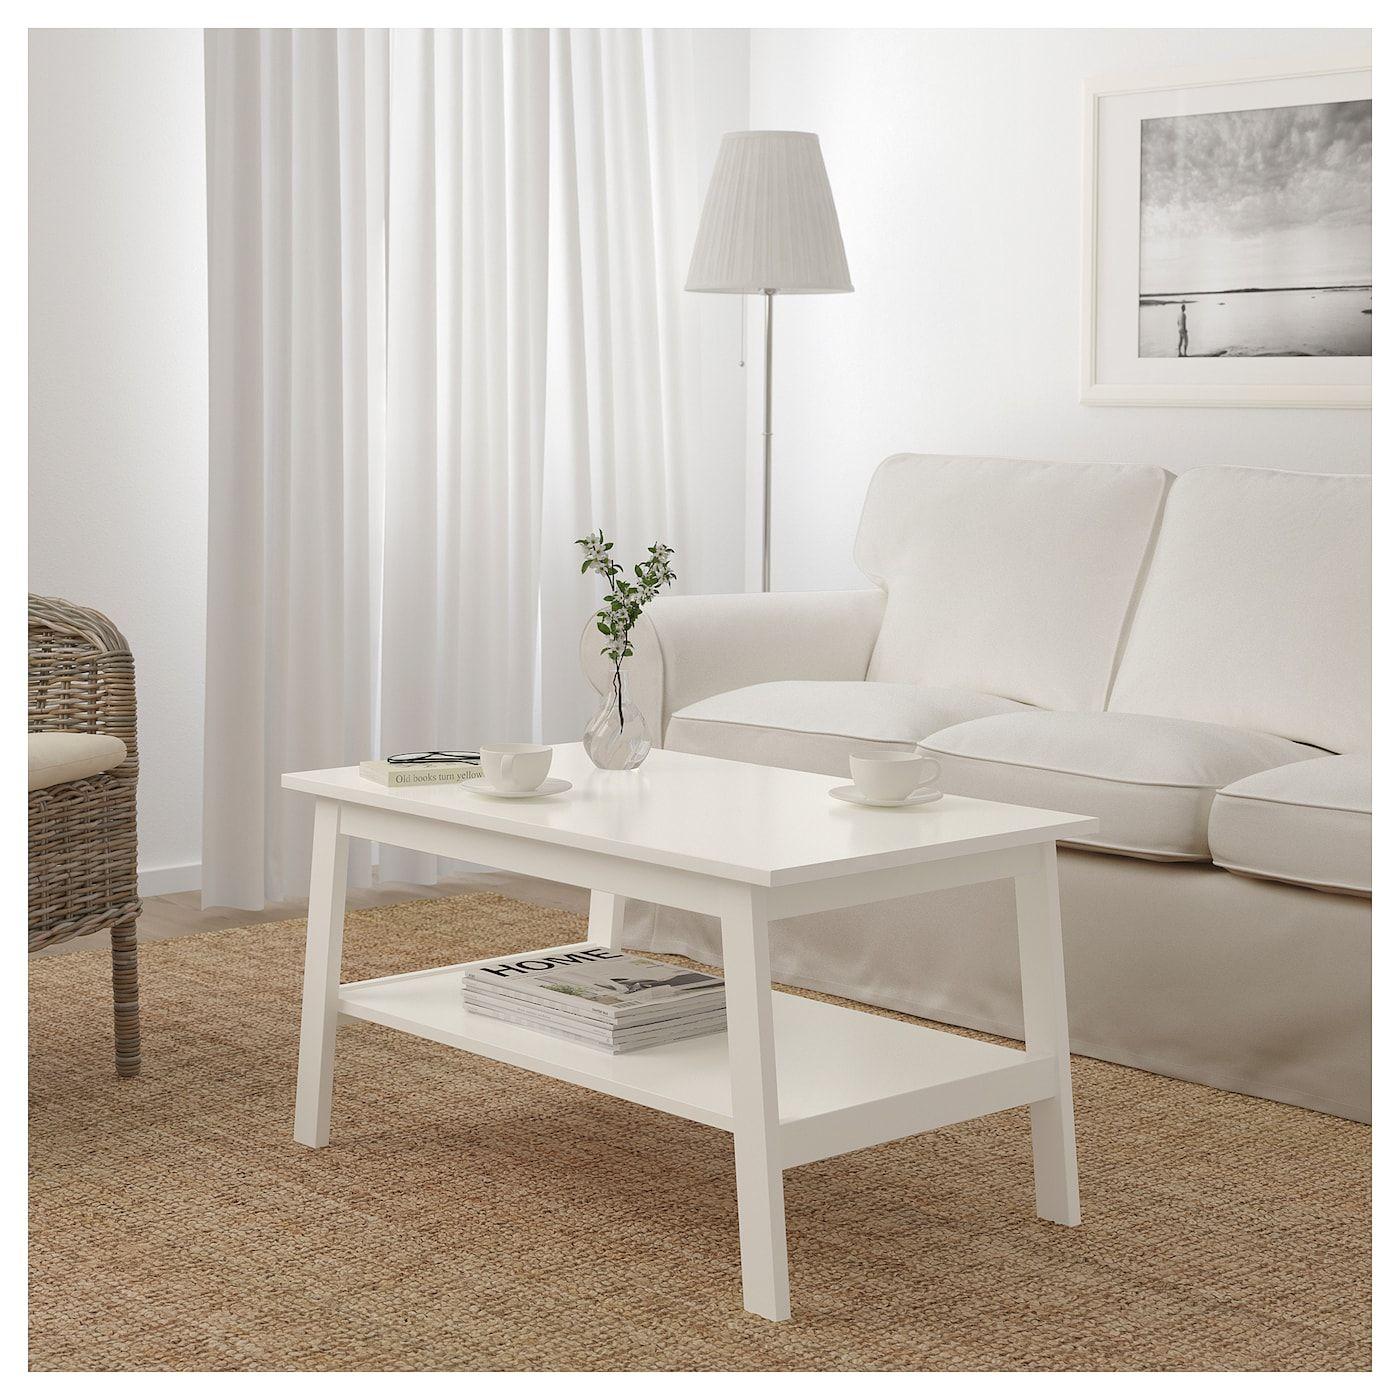 Lunnarp Stolik Bialy 90x55 Cm Kupuj Online Lub W Sklepie Ikea Quality Living Room Furniture Coffee Table Coffee Table White [ 1400 x 1400 Pixel ]